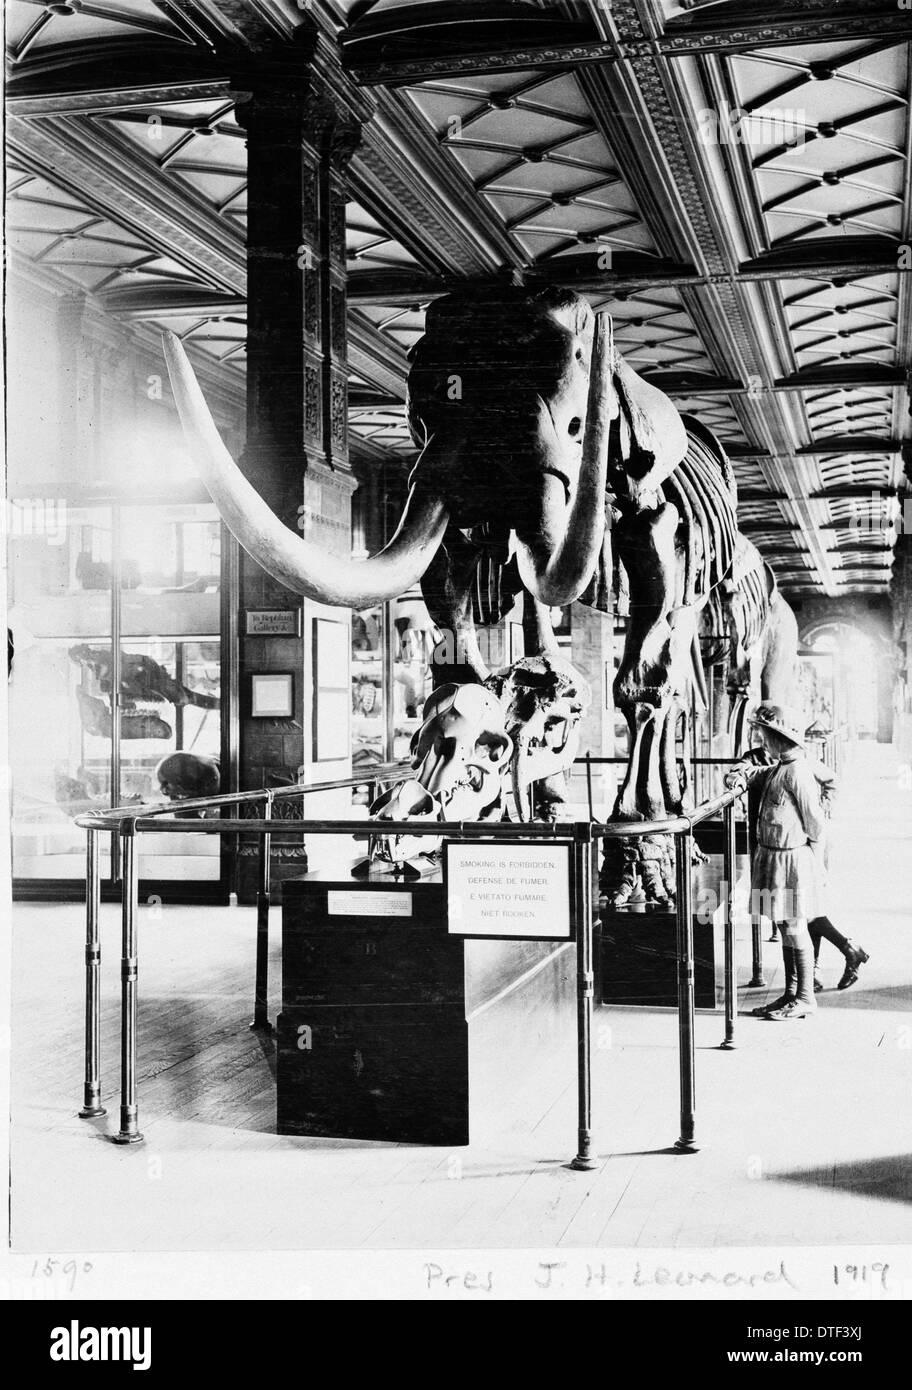 Mastodon in Geological Gallery, December 1919 - Stock Image